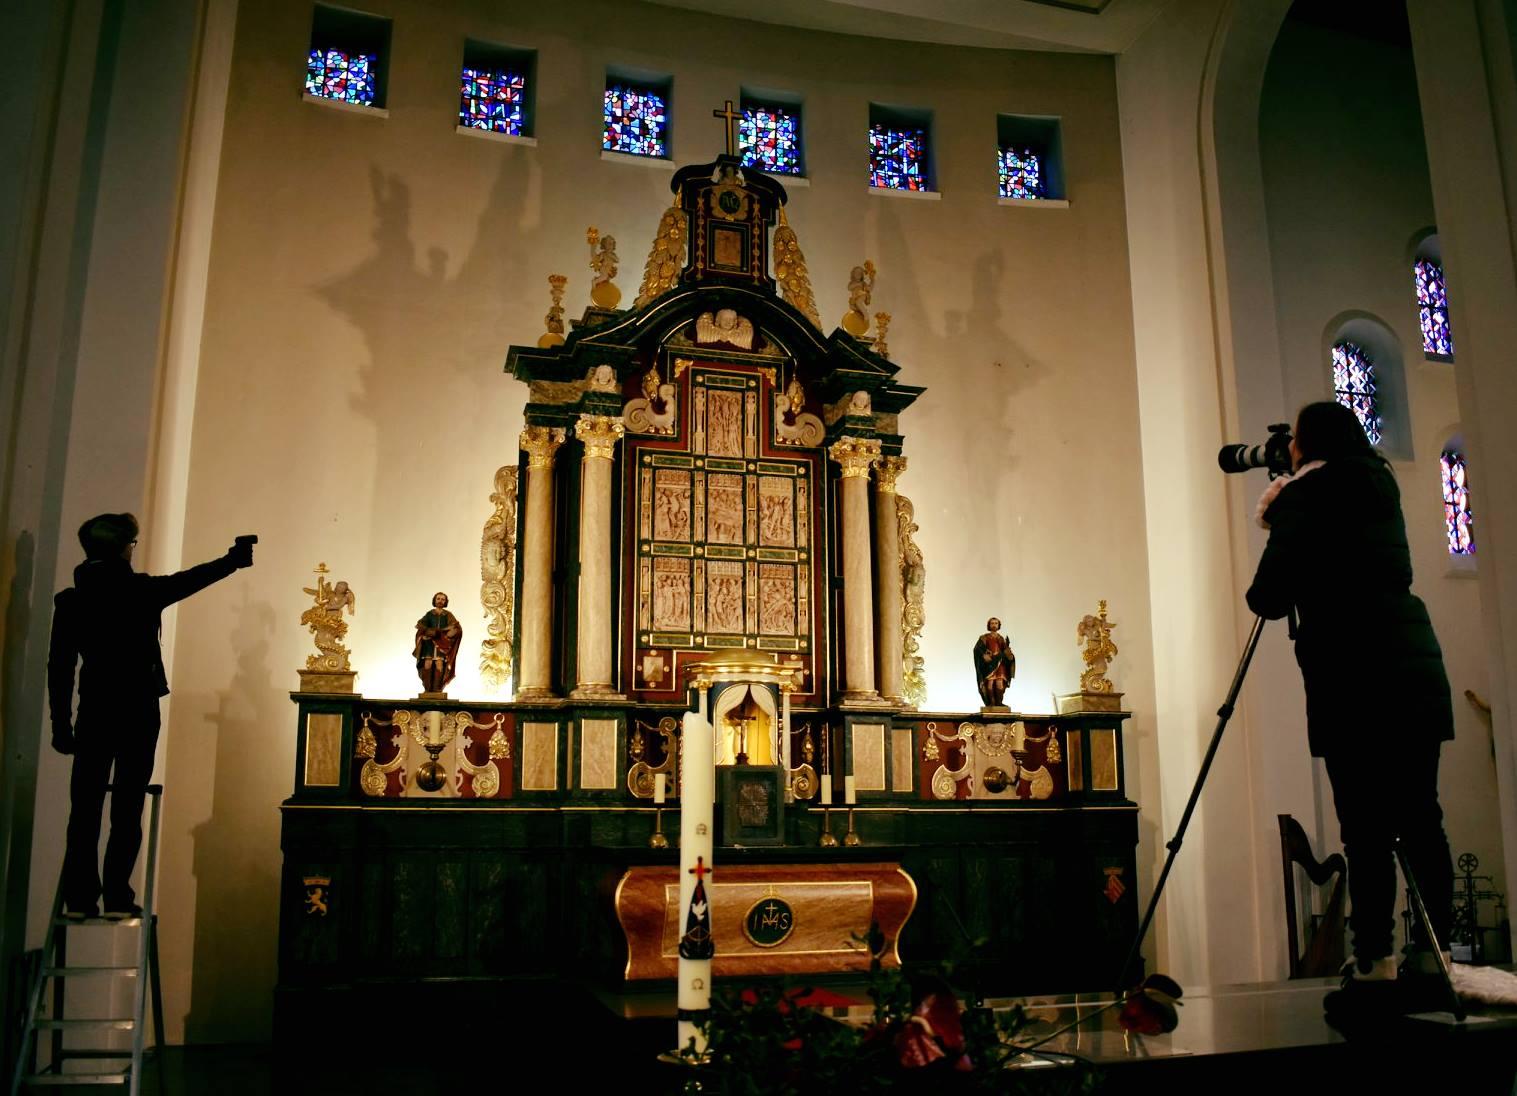 Albasten altaarpanelen Offerse kerk fotogeniek